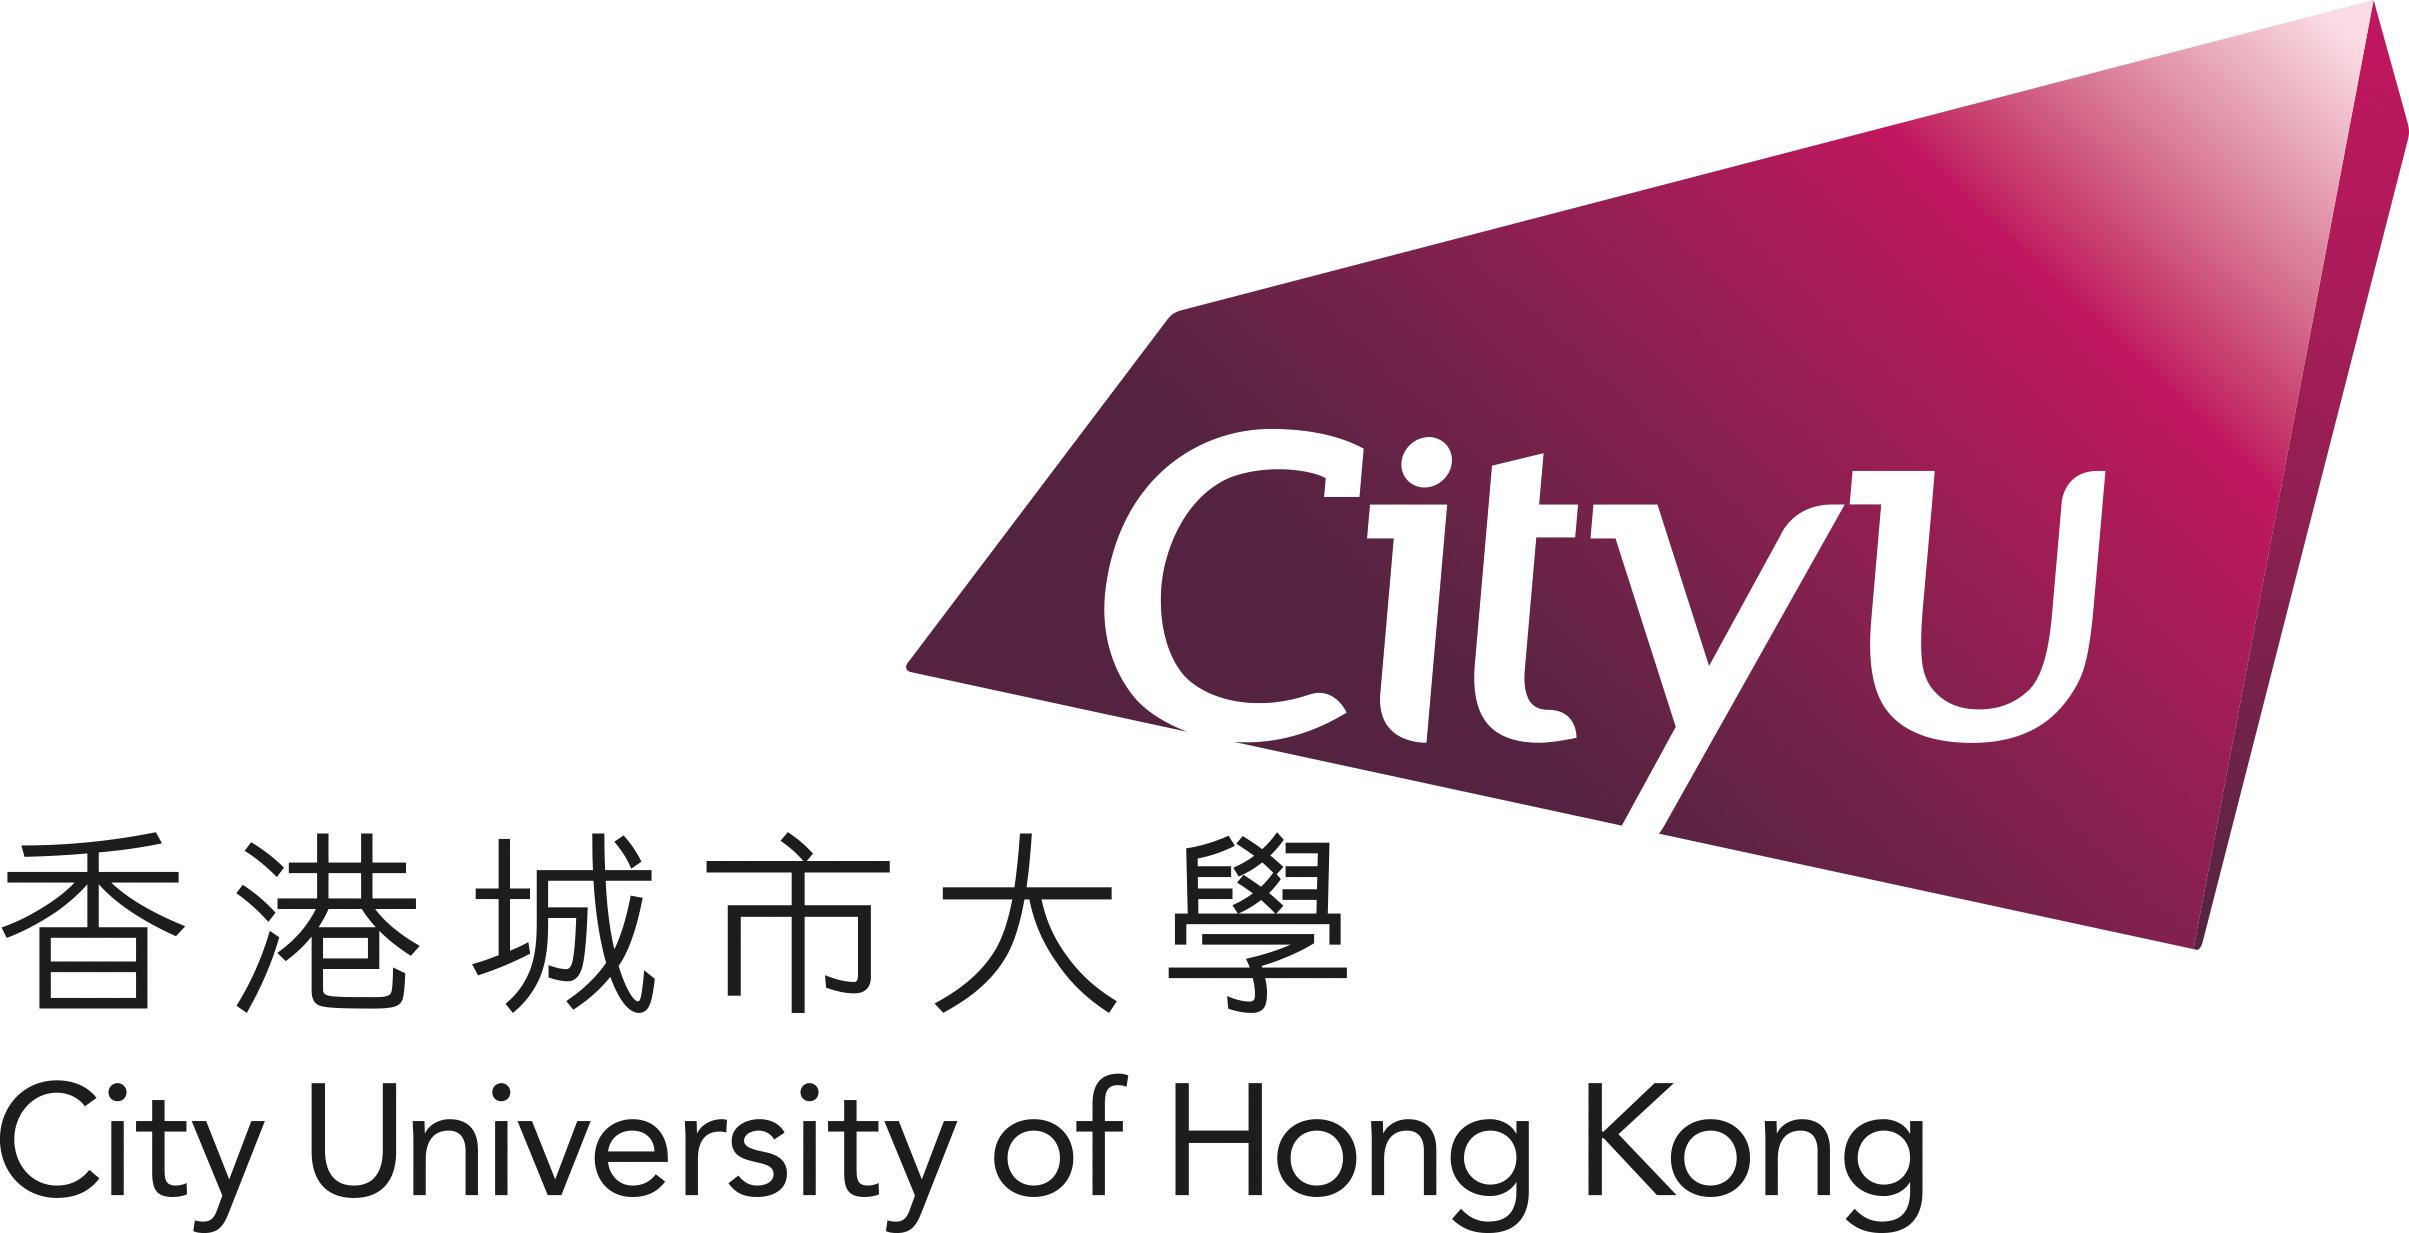 cityu_logo